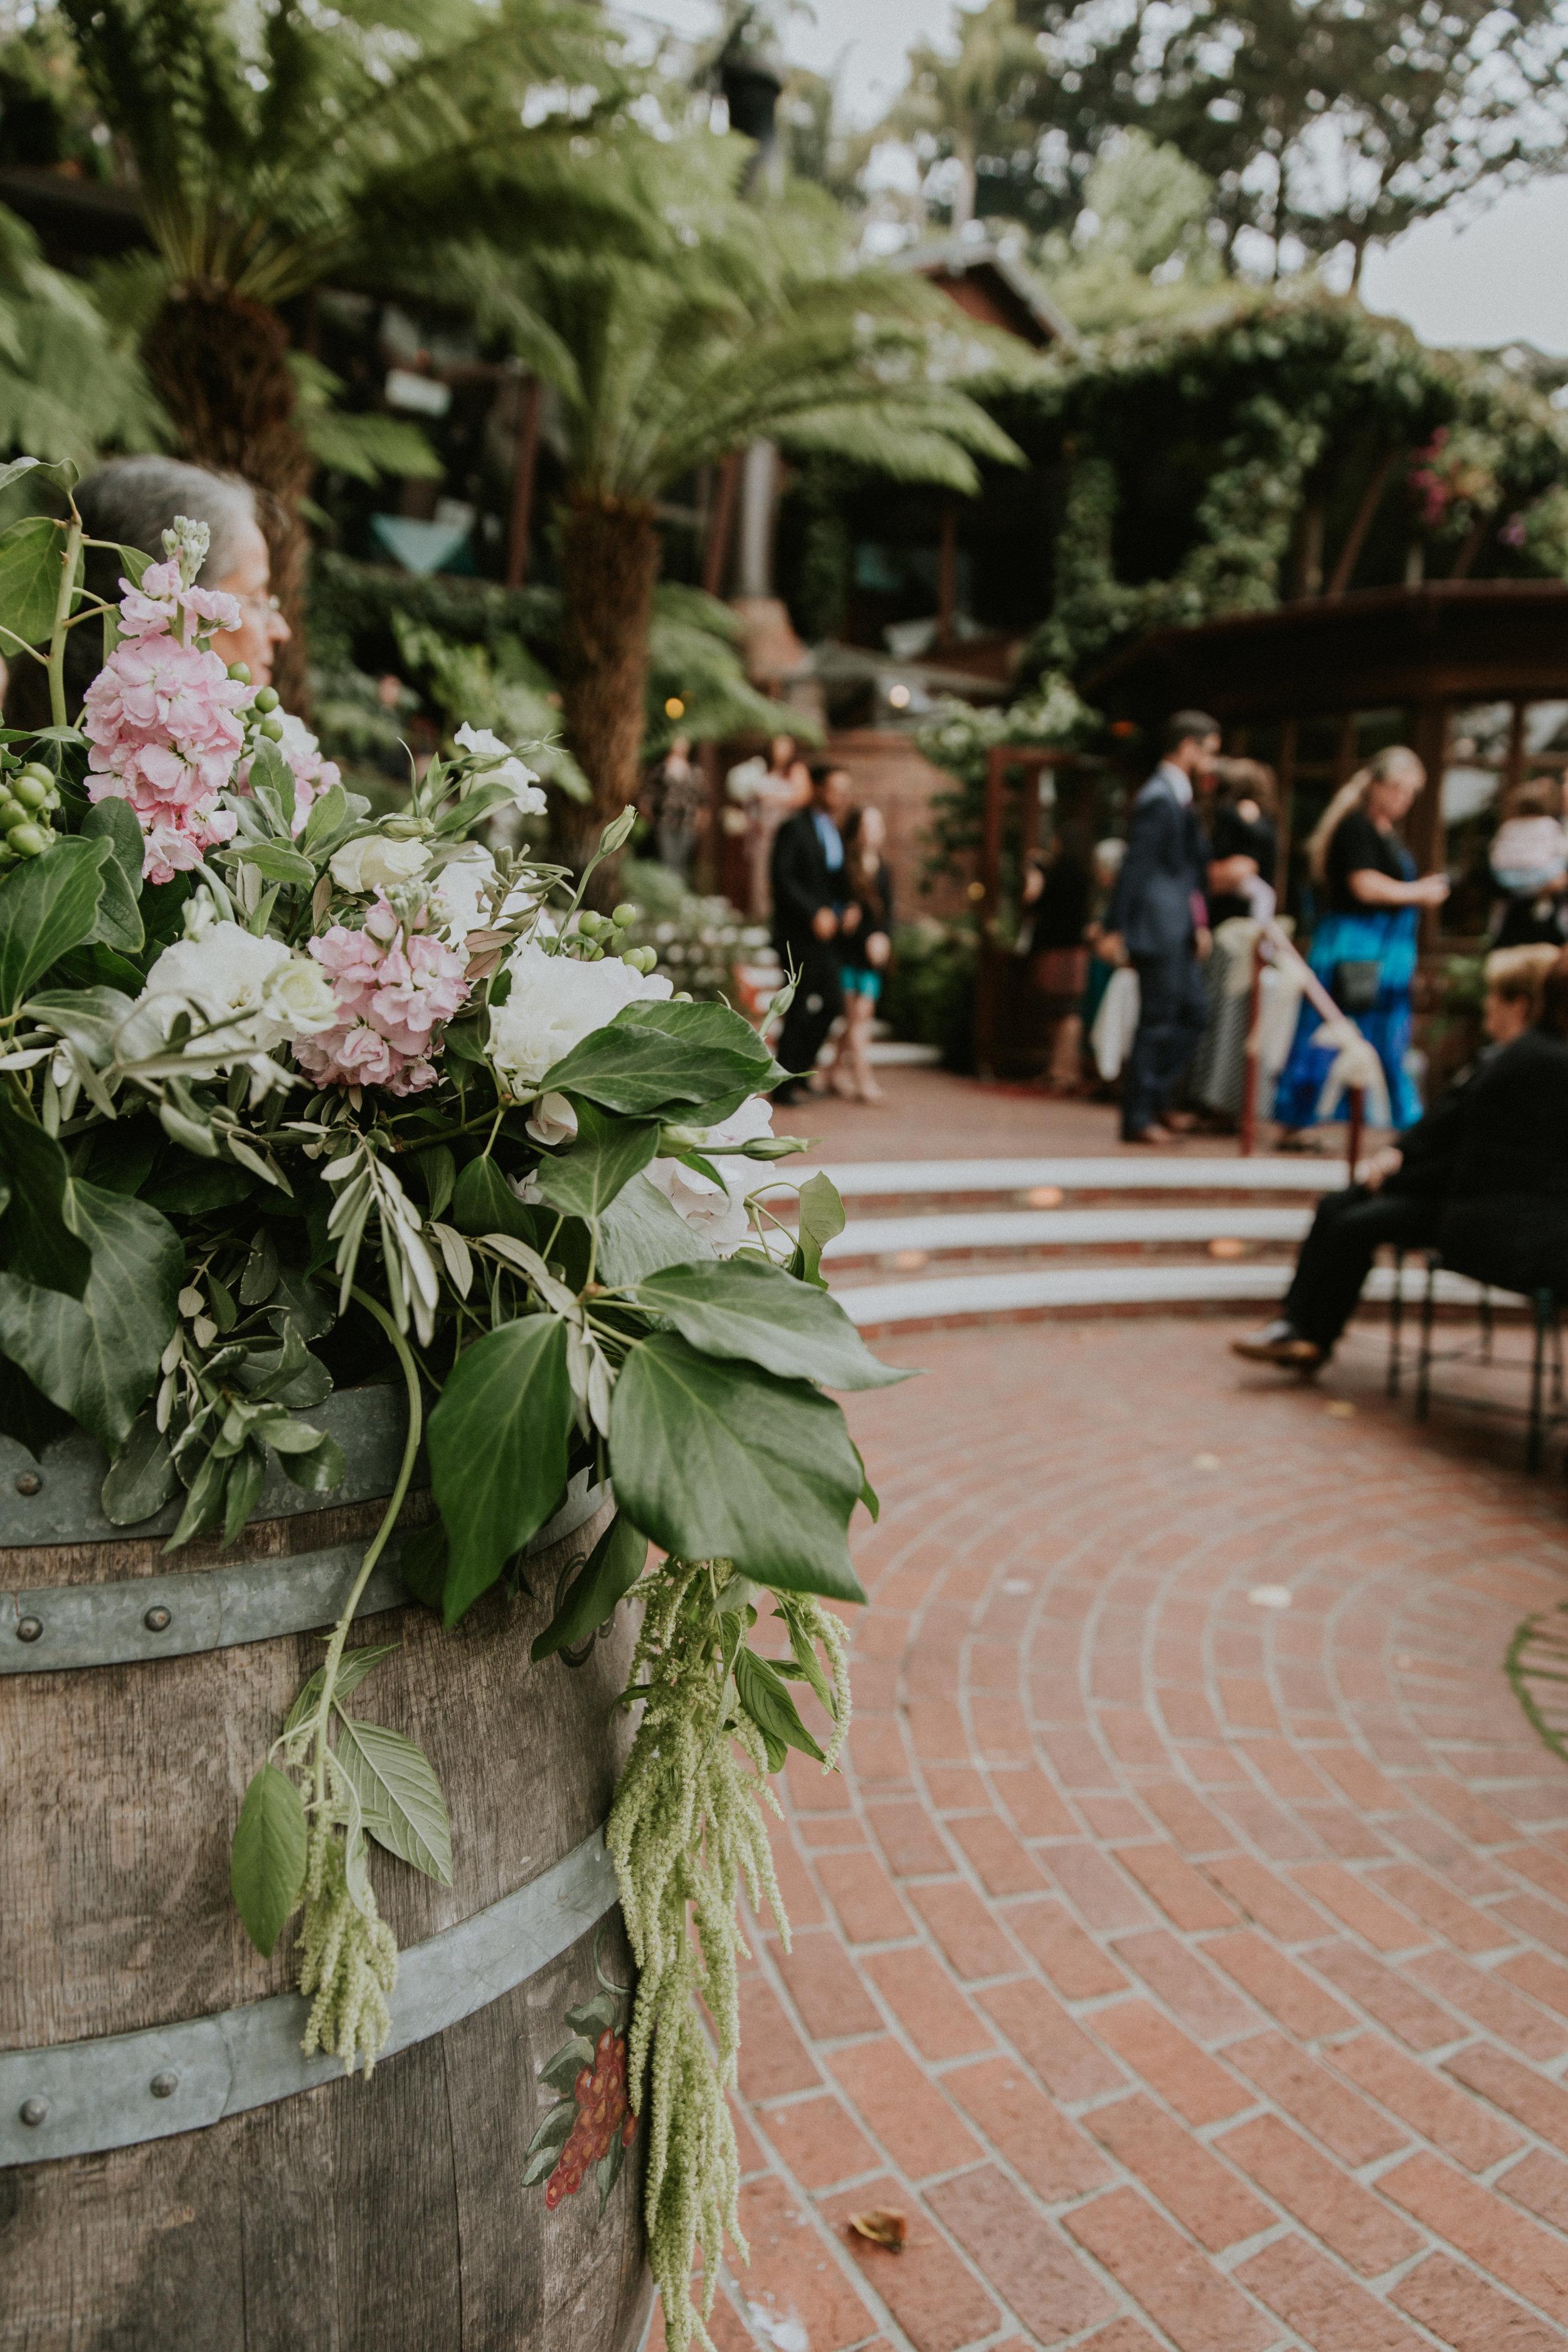 Capitola-Santa-Cruz-wedding-photographer-115.jpg